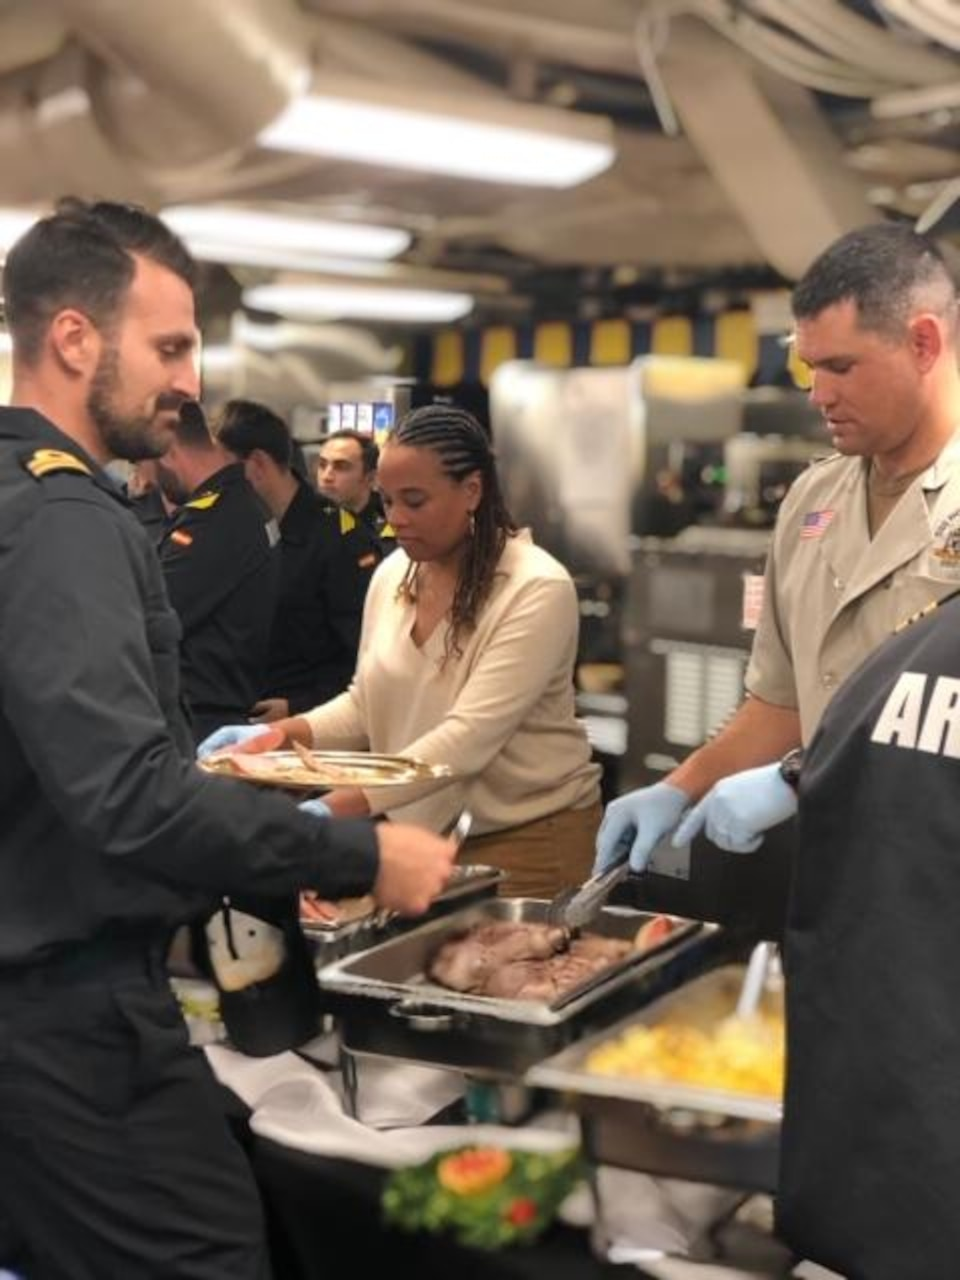 USS Ross hosts Thanksgiving dinner for ESPS Reina Sofia Sailors